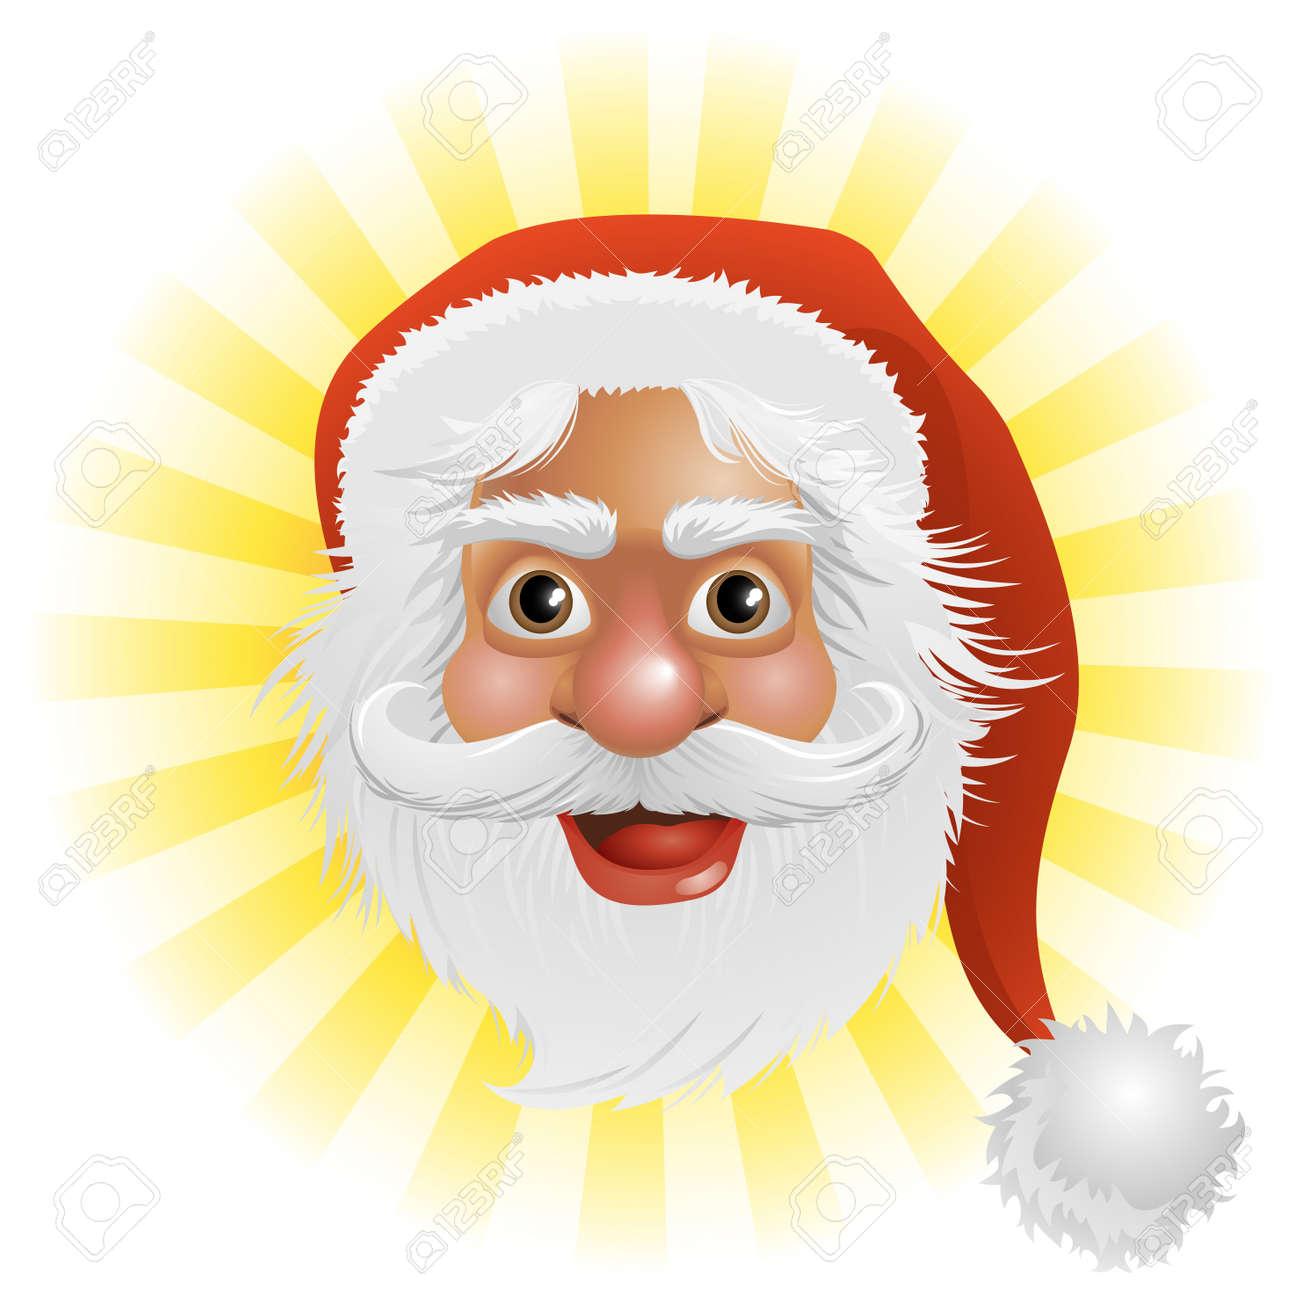 An illustration of a happy Christmas Santa Claus face Stock Vector - 11272673